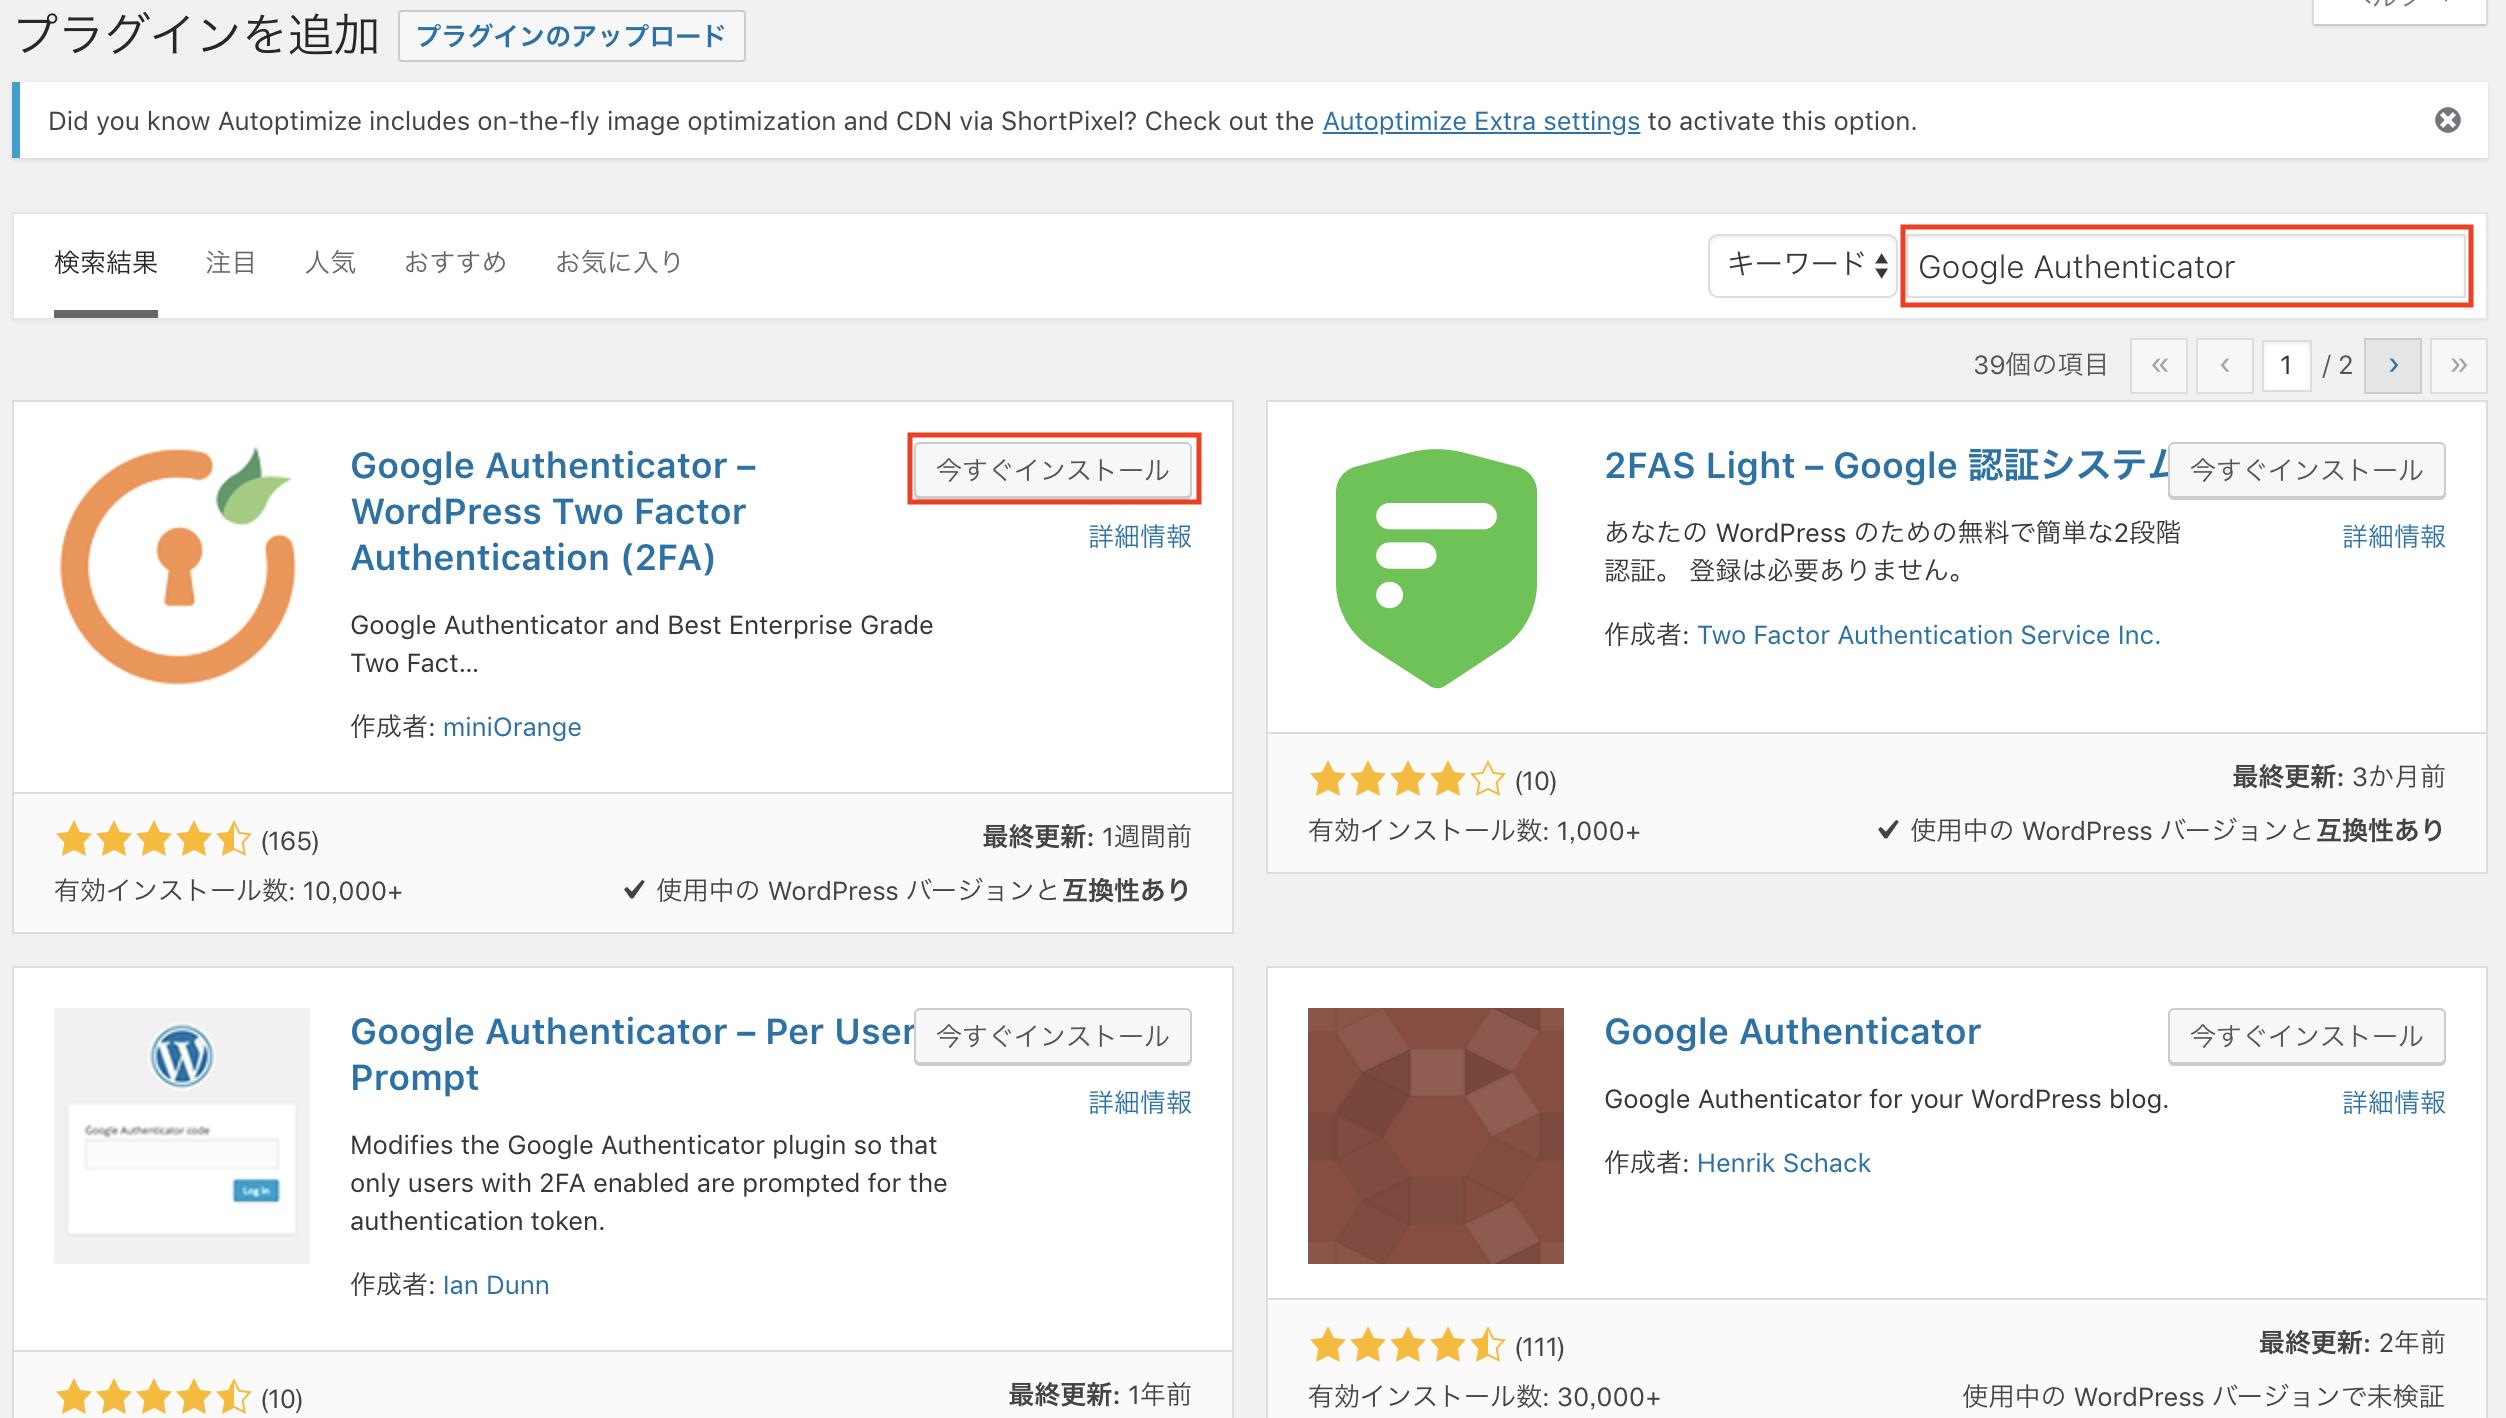 GoogleAuthenticatarインストール画像